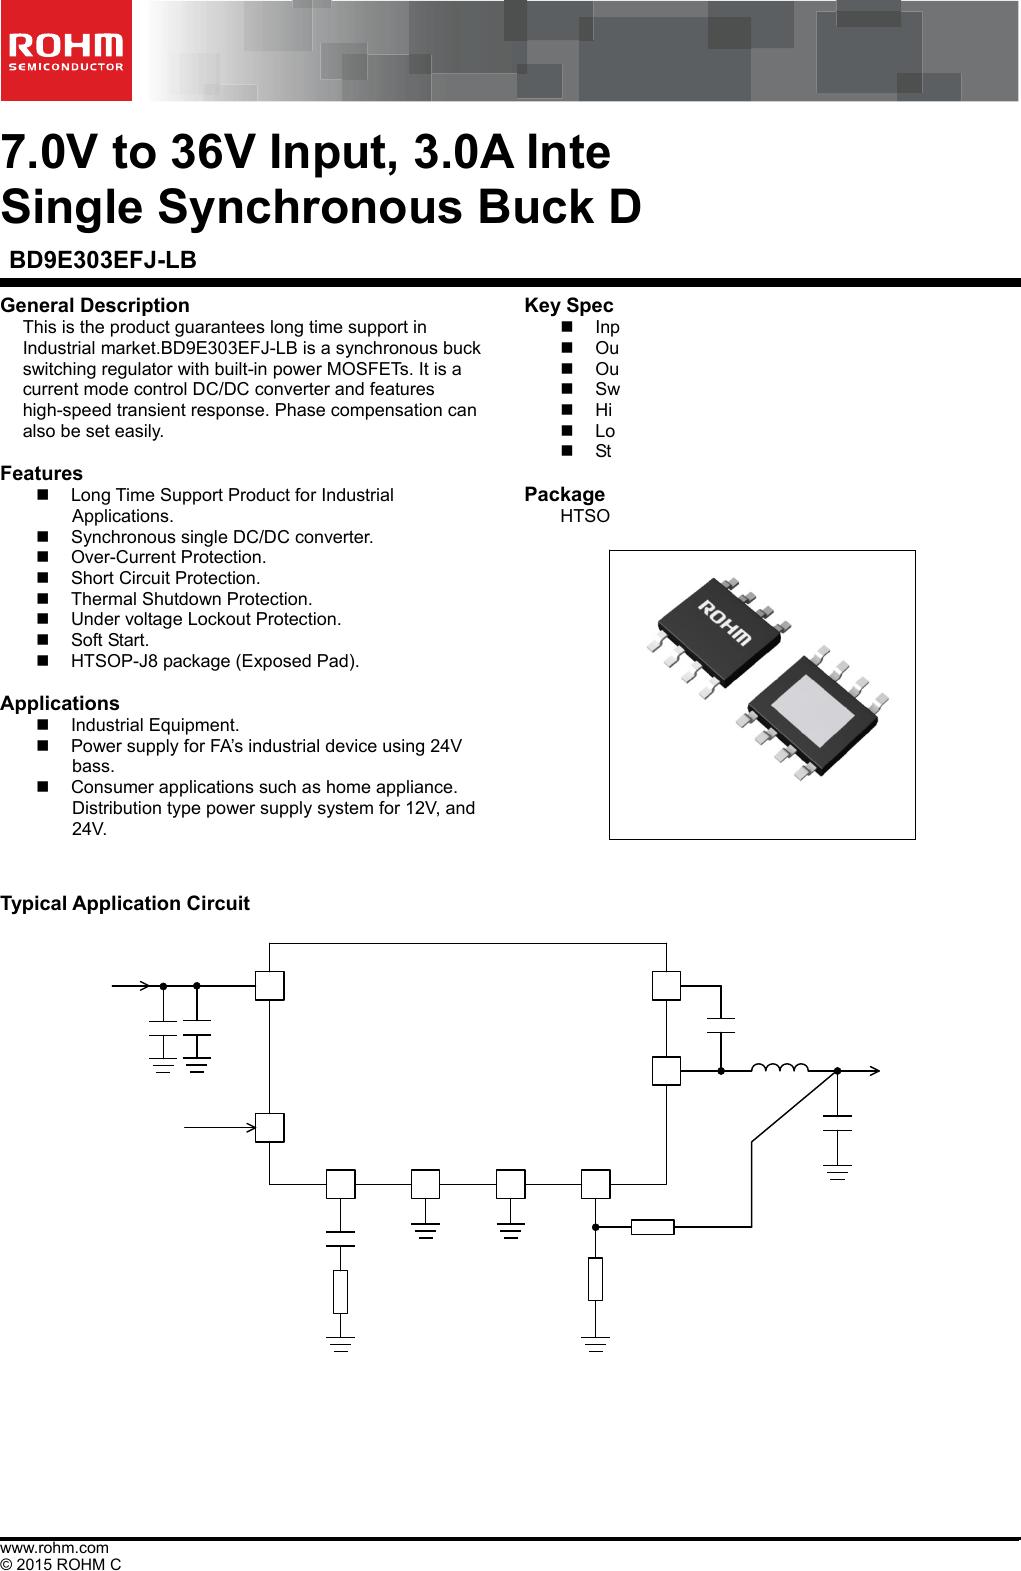 hight resolution of bd9e303efj lb datasheet rohm semiconductor digikey hose furthermore condenser microphone diagram as well 24v relay coil